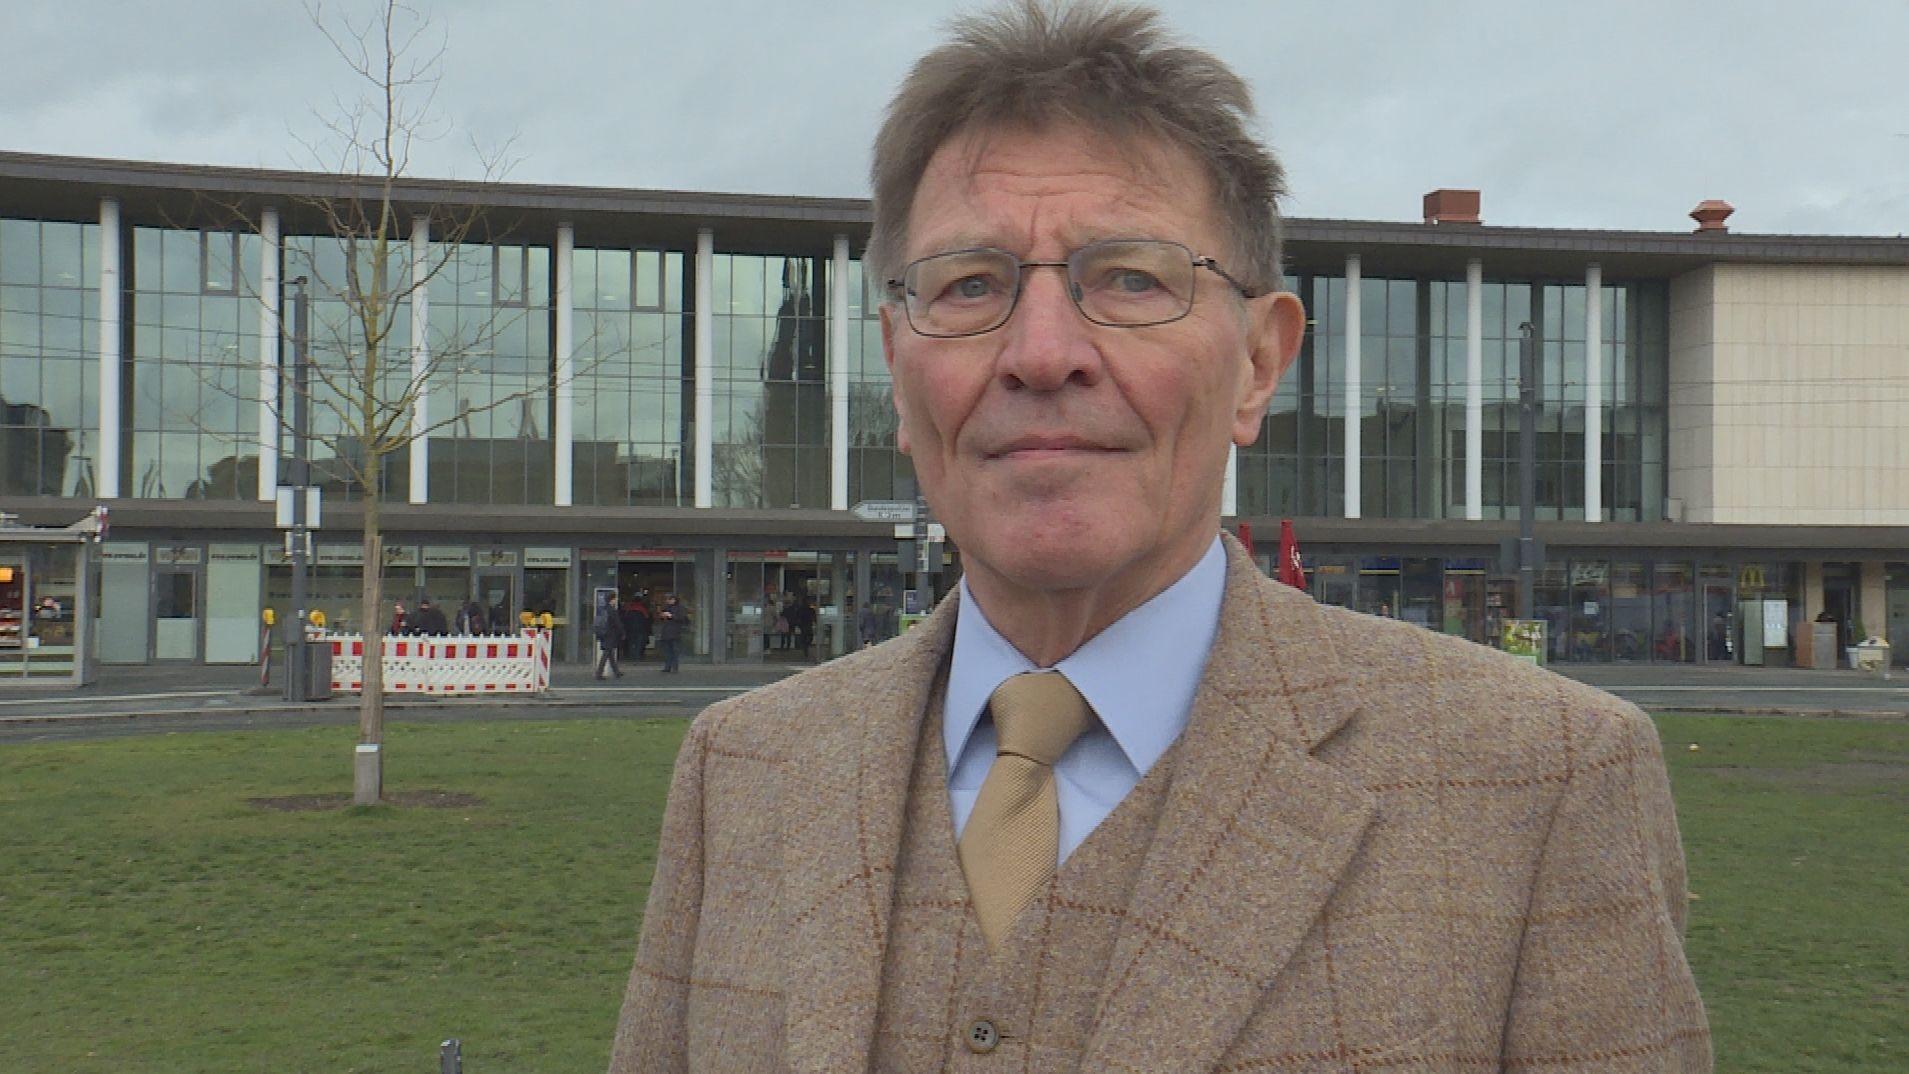 Eberhard Sinner vor dem Würzburger Hauptbahnhof